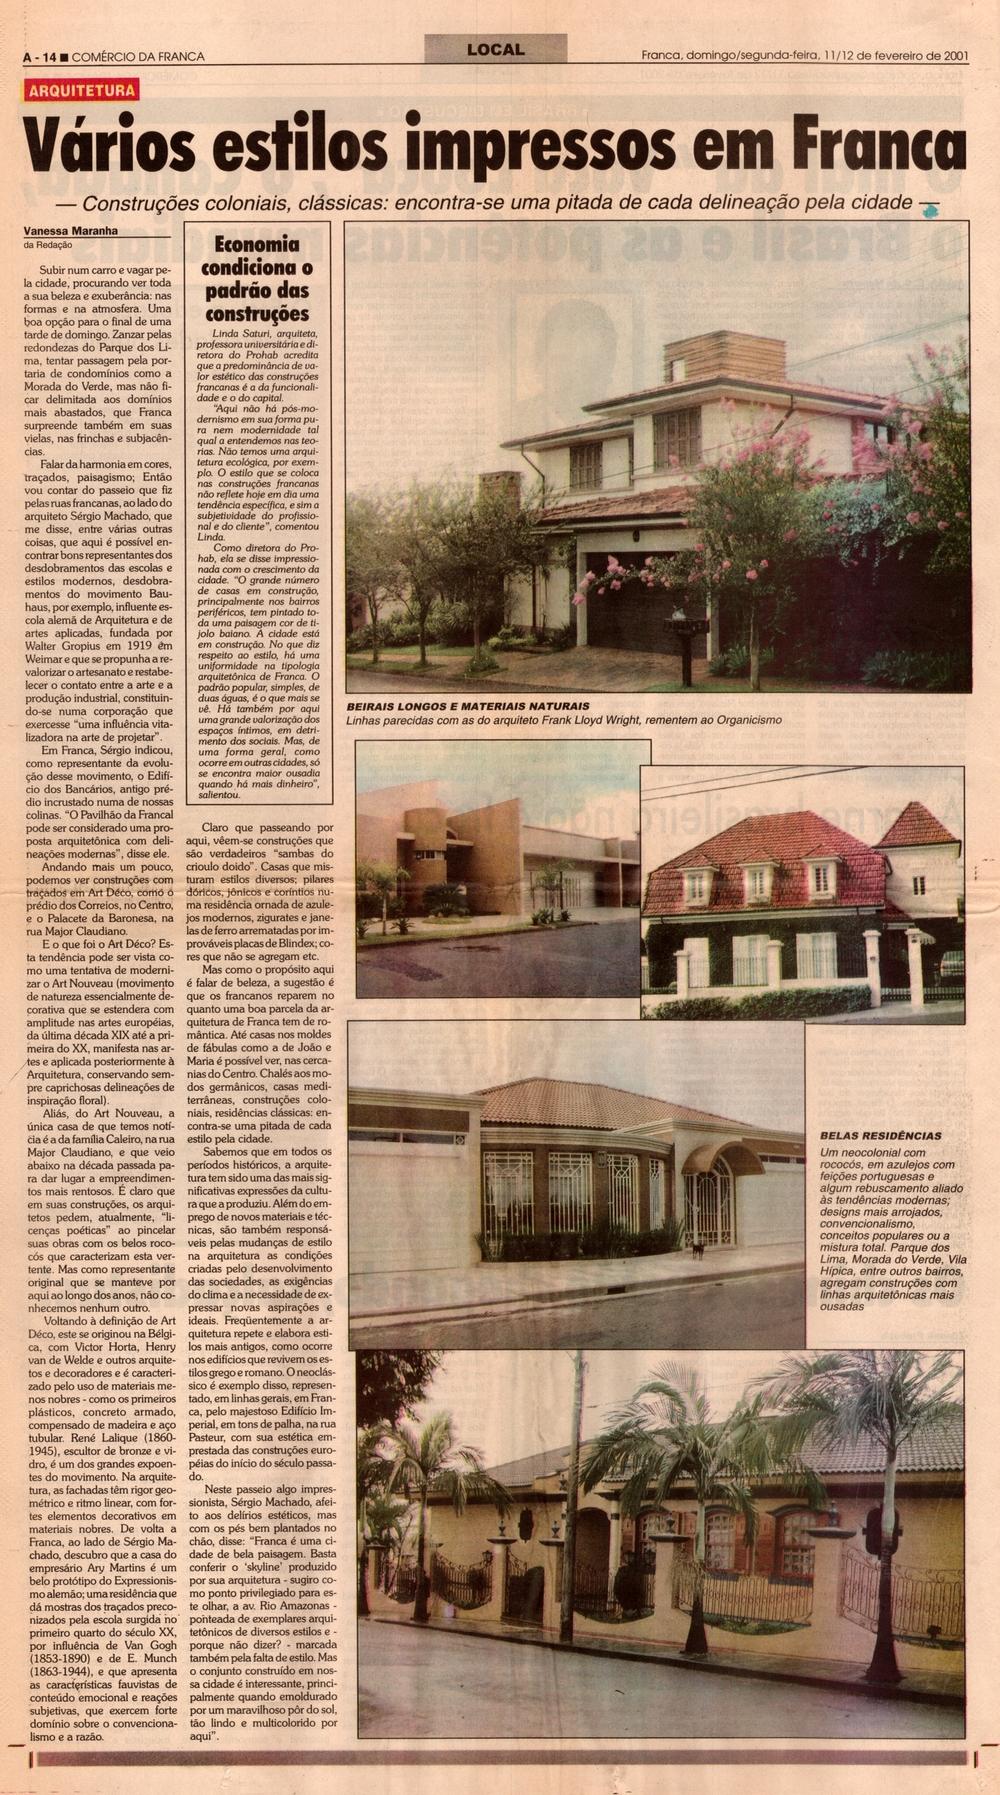 Entrevista Jornal Comércio da Franca - 2001 - 11 fevereiro.jpg